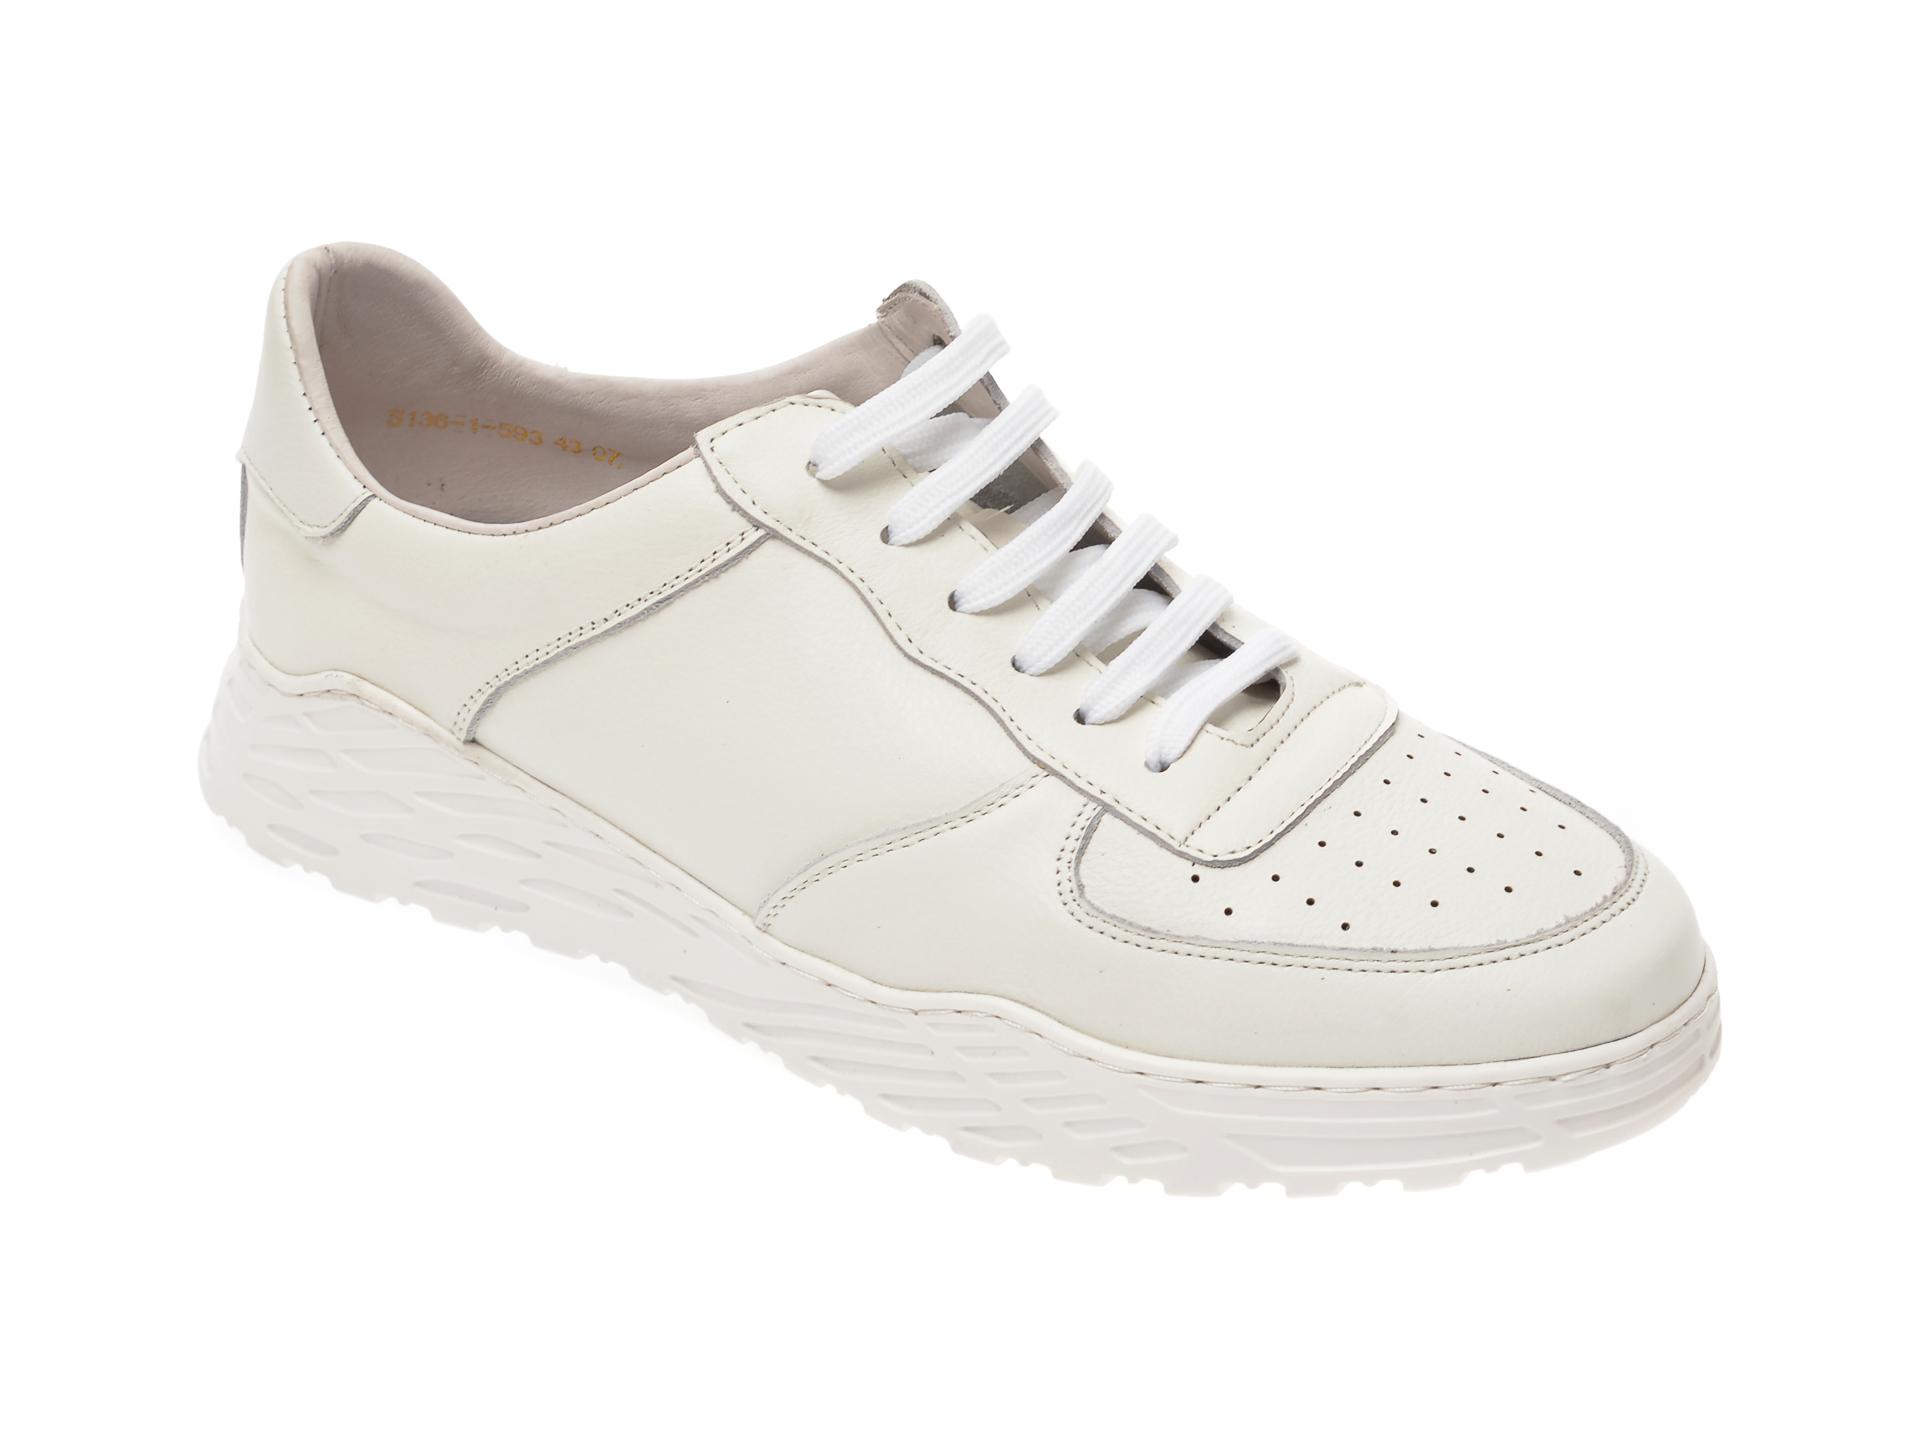 Pantofi Otter Albi, S136, Din Piele Naturala